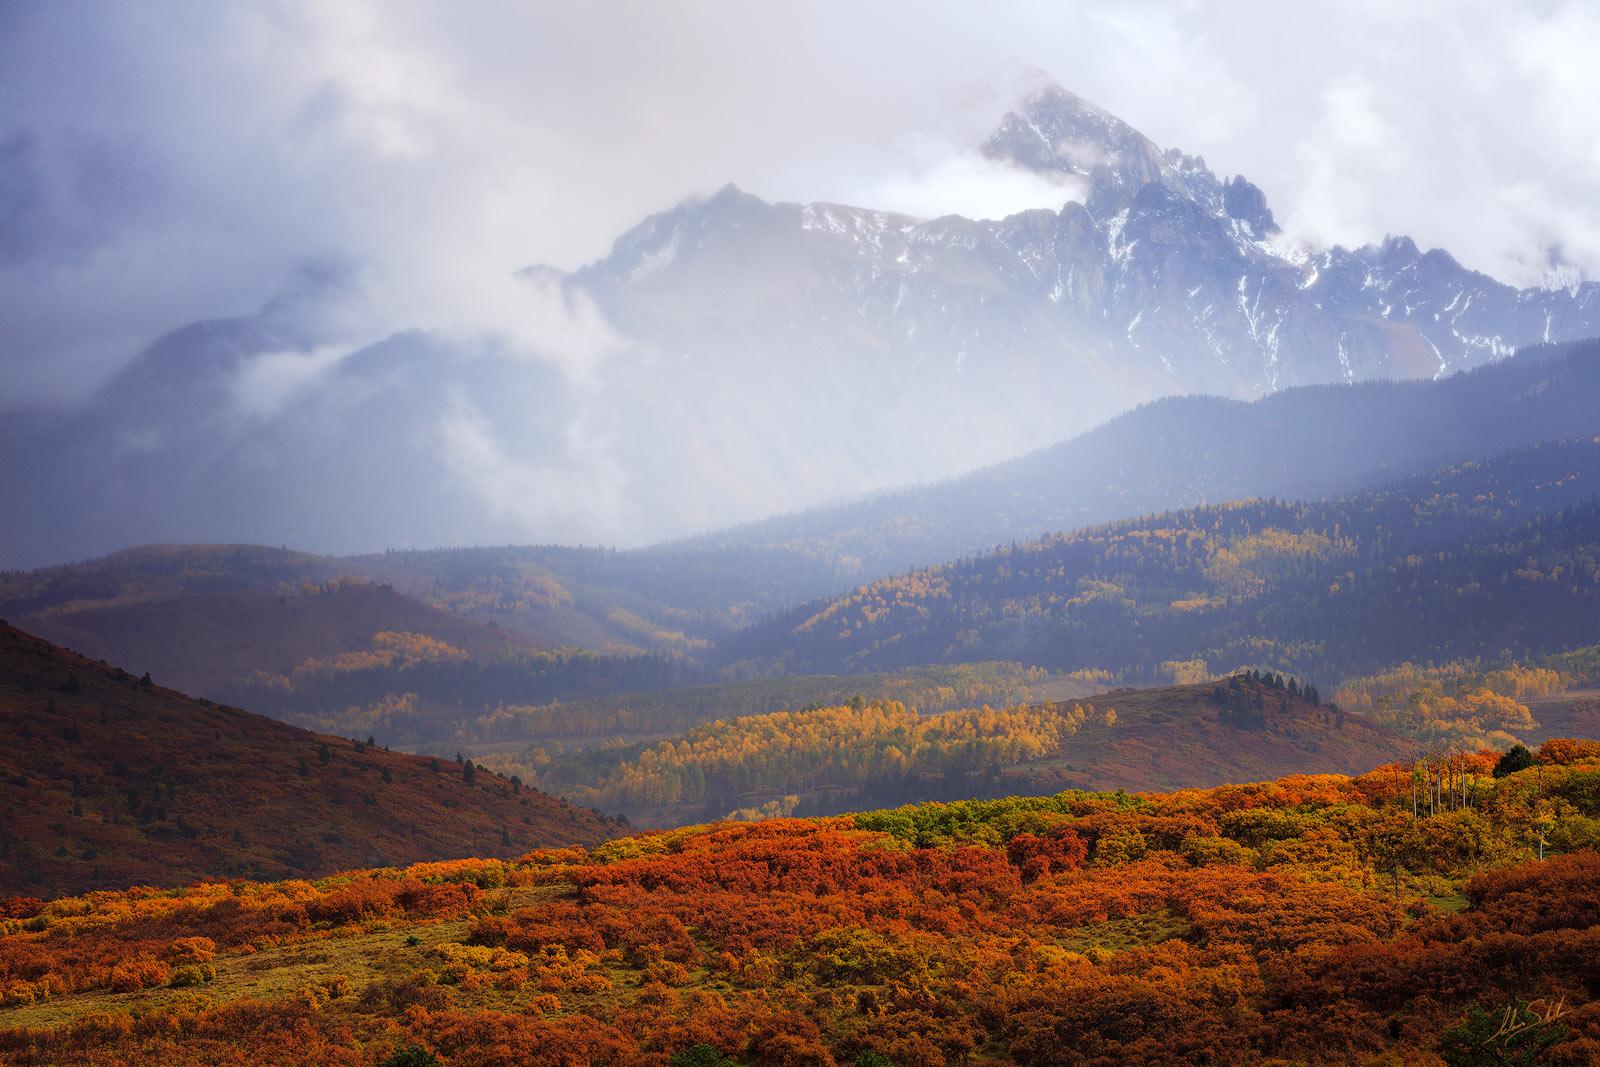 Autumn, Colorado, Dallas Divide, Fall, Fall Color, Mount Sneffels, Ouray, Ridgway, San Juan Mountains, Sneffels, Sneffels Range, T-Ride, Telluride, photo